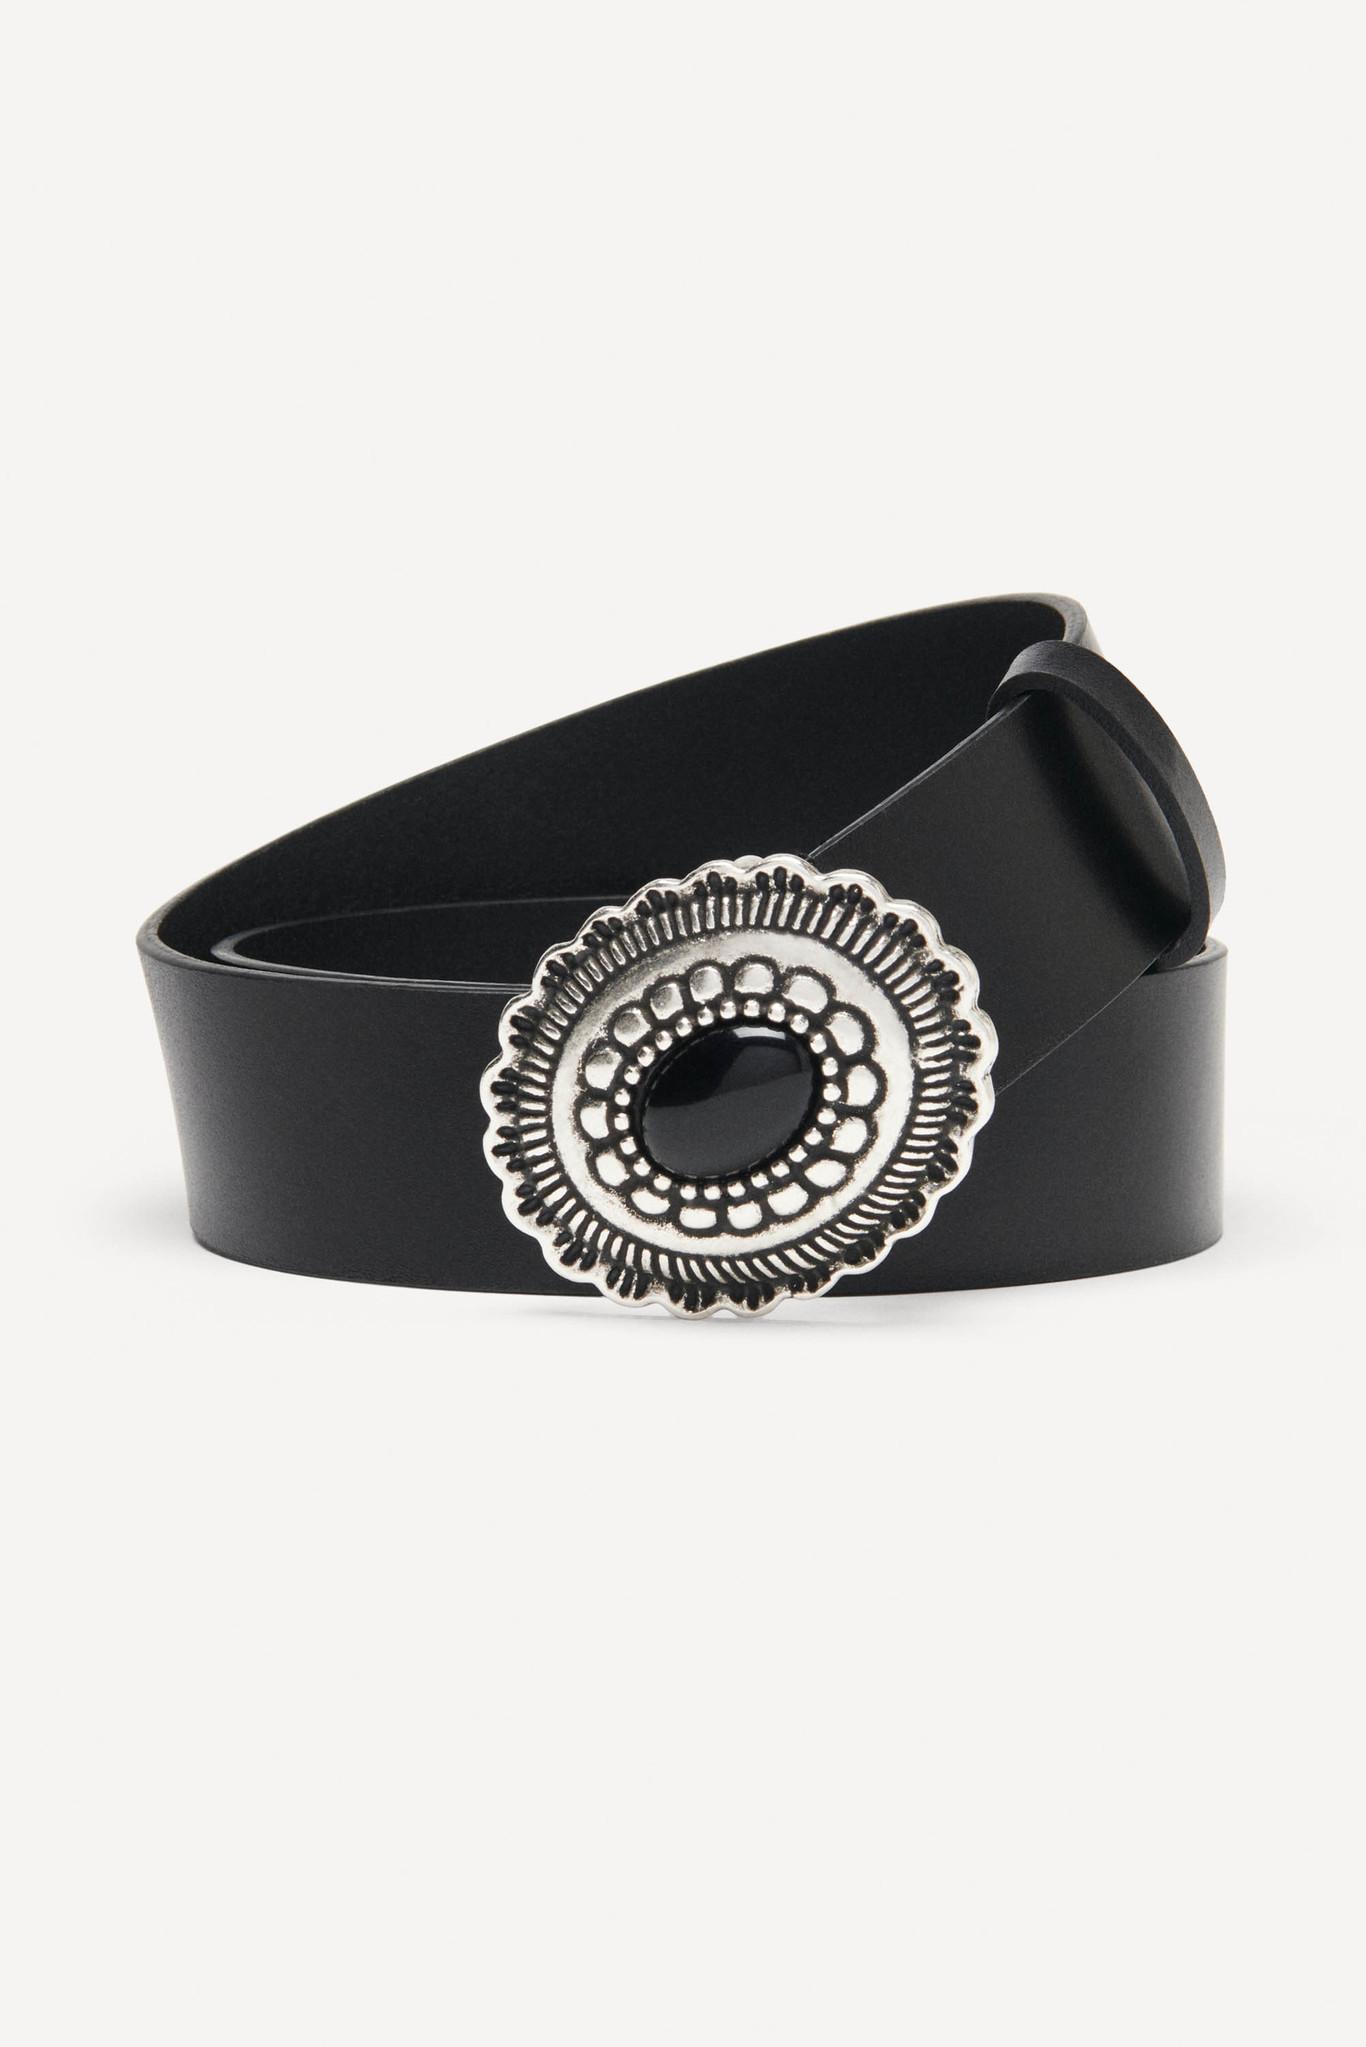 BA&SH ceinture bacara-3